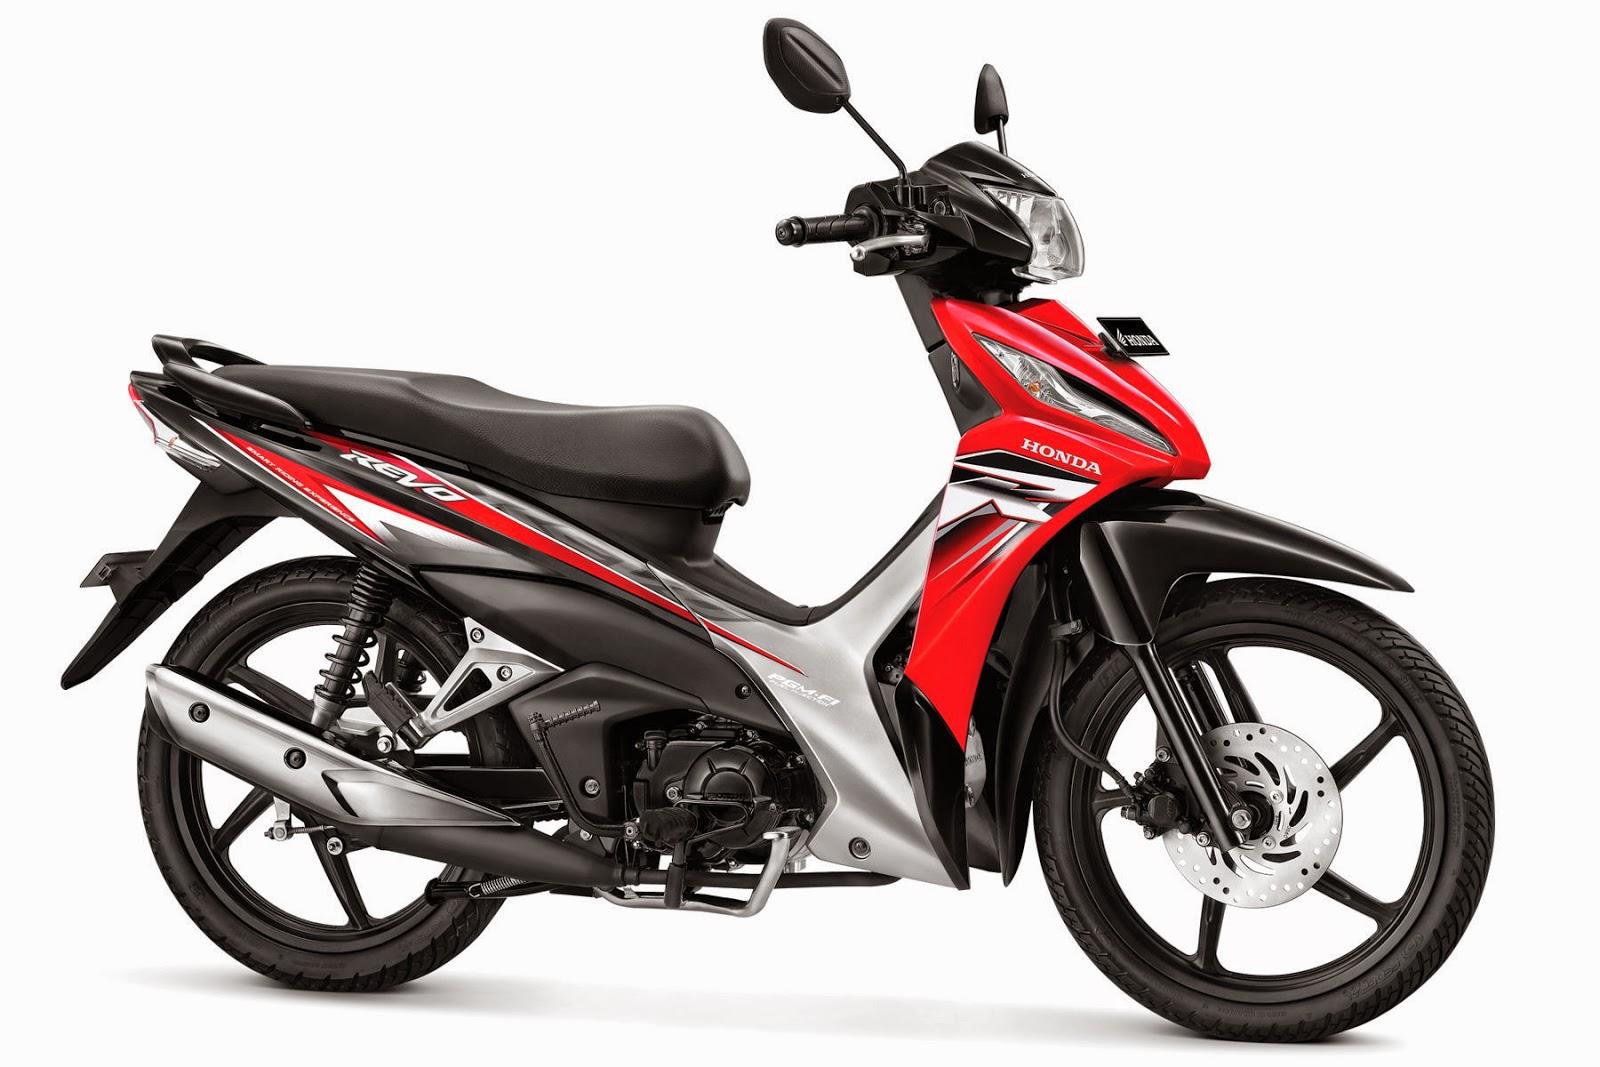 Gambar Modifikasi Motor New Honda Revo 2014